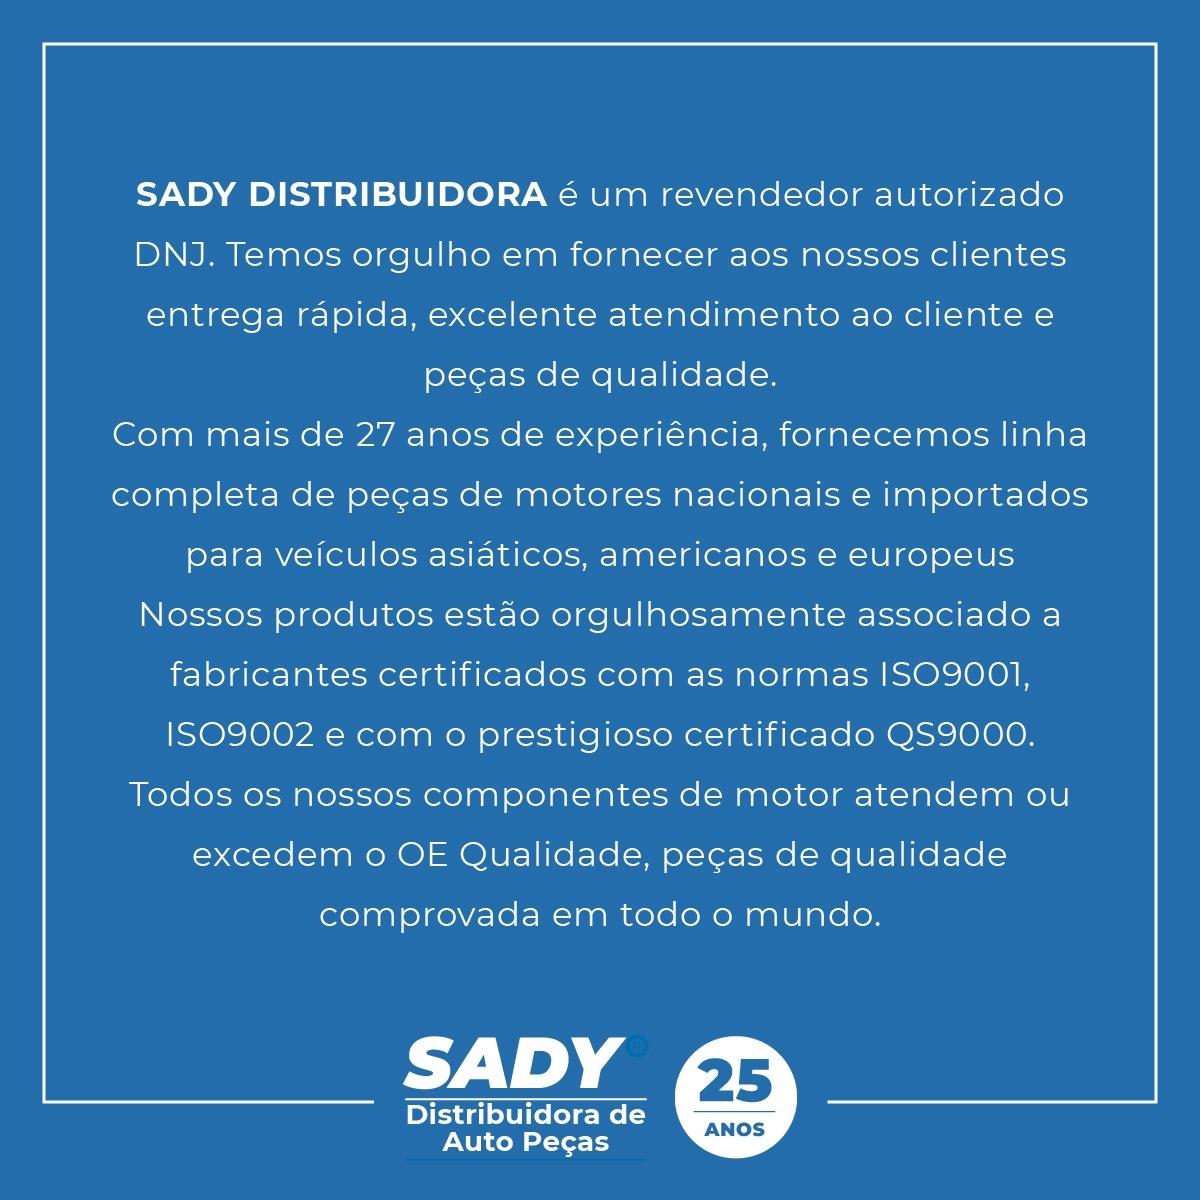 BOMBA DE OLEO DO MOTOR TOYOTA 3.0 1KZT